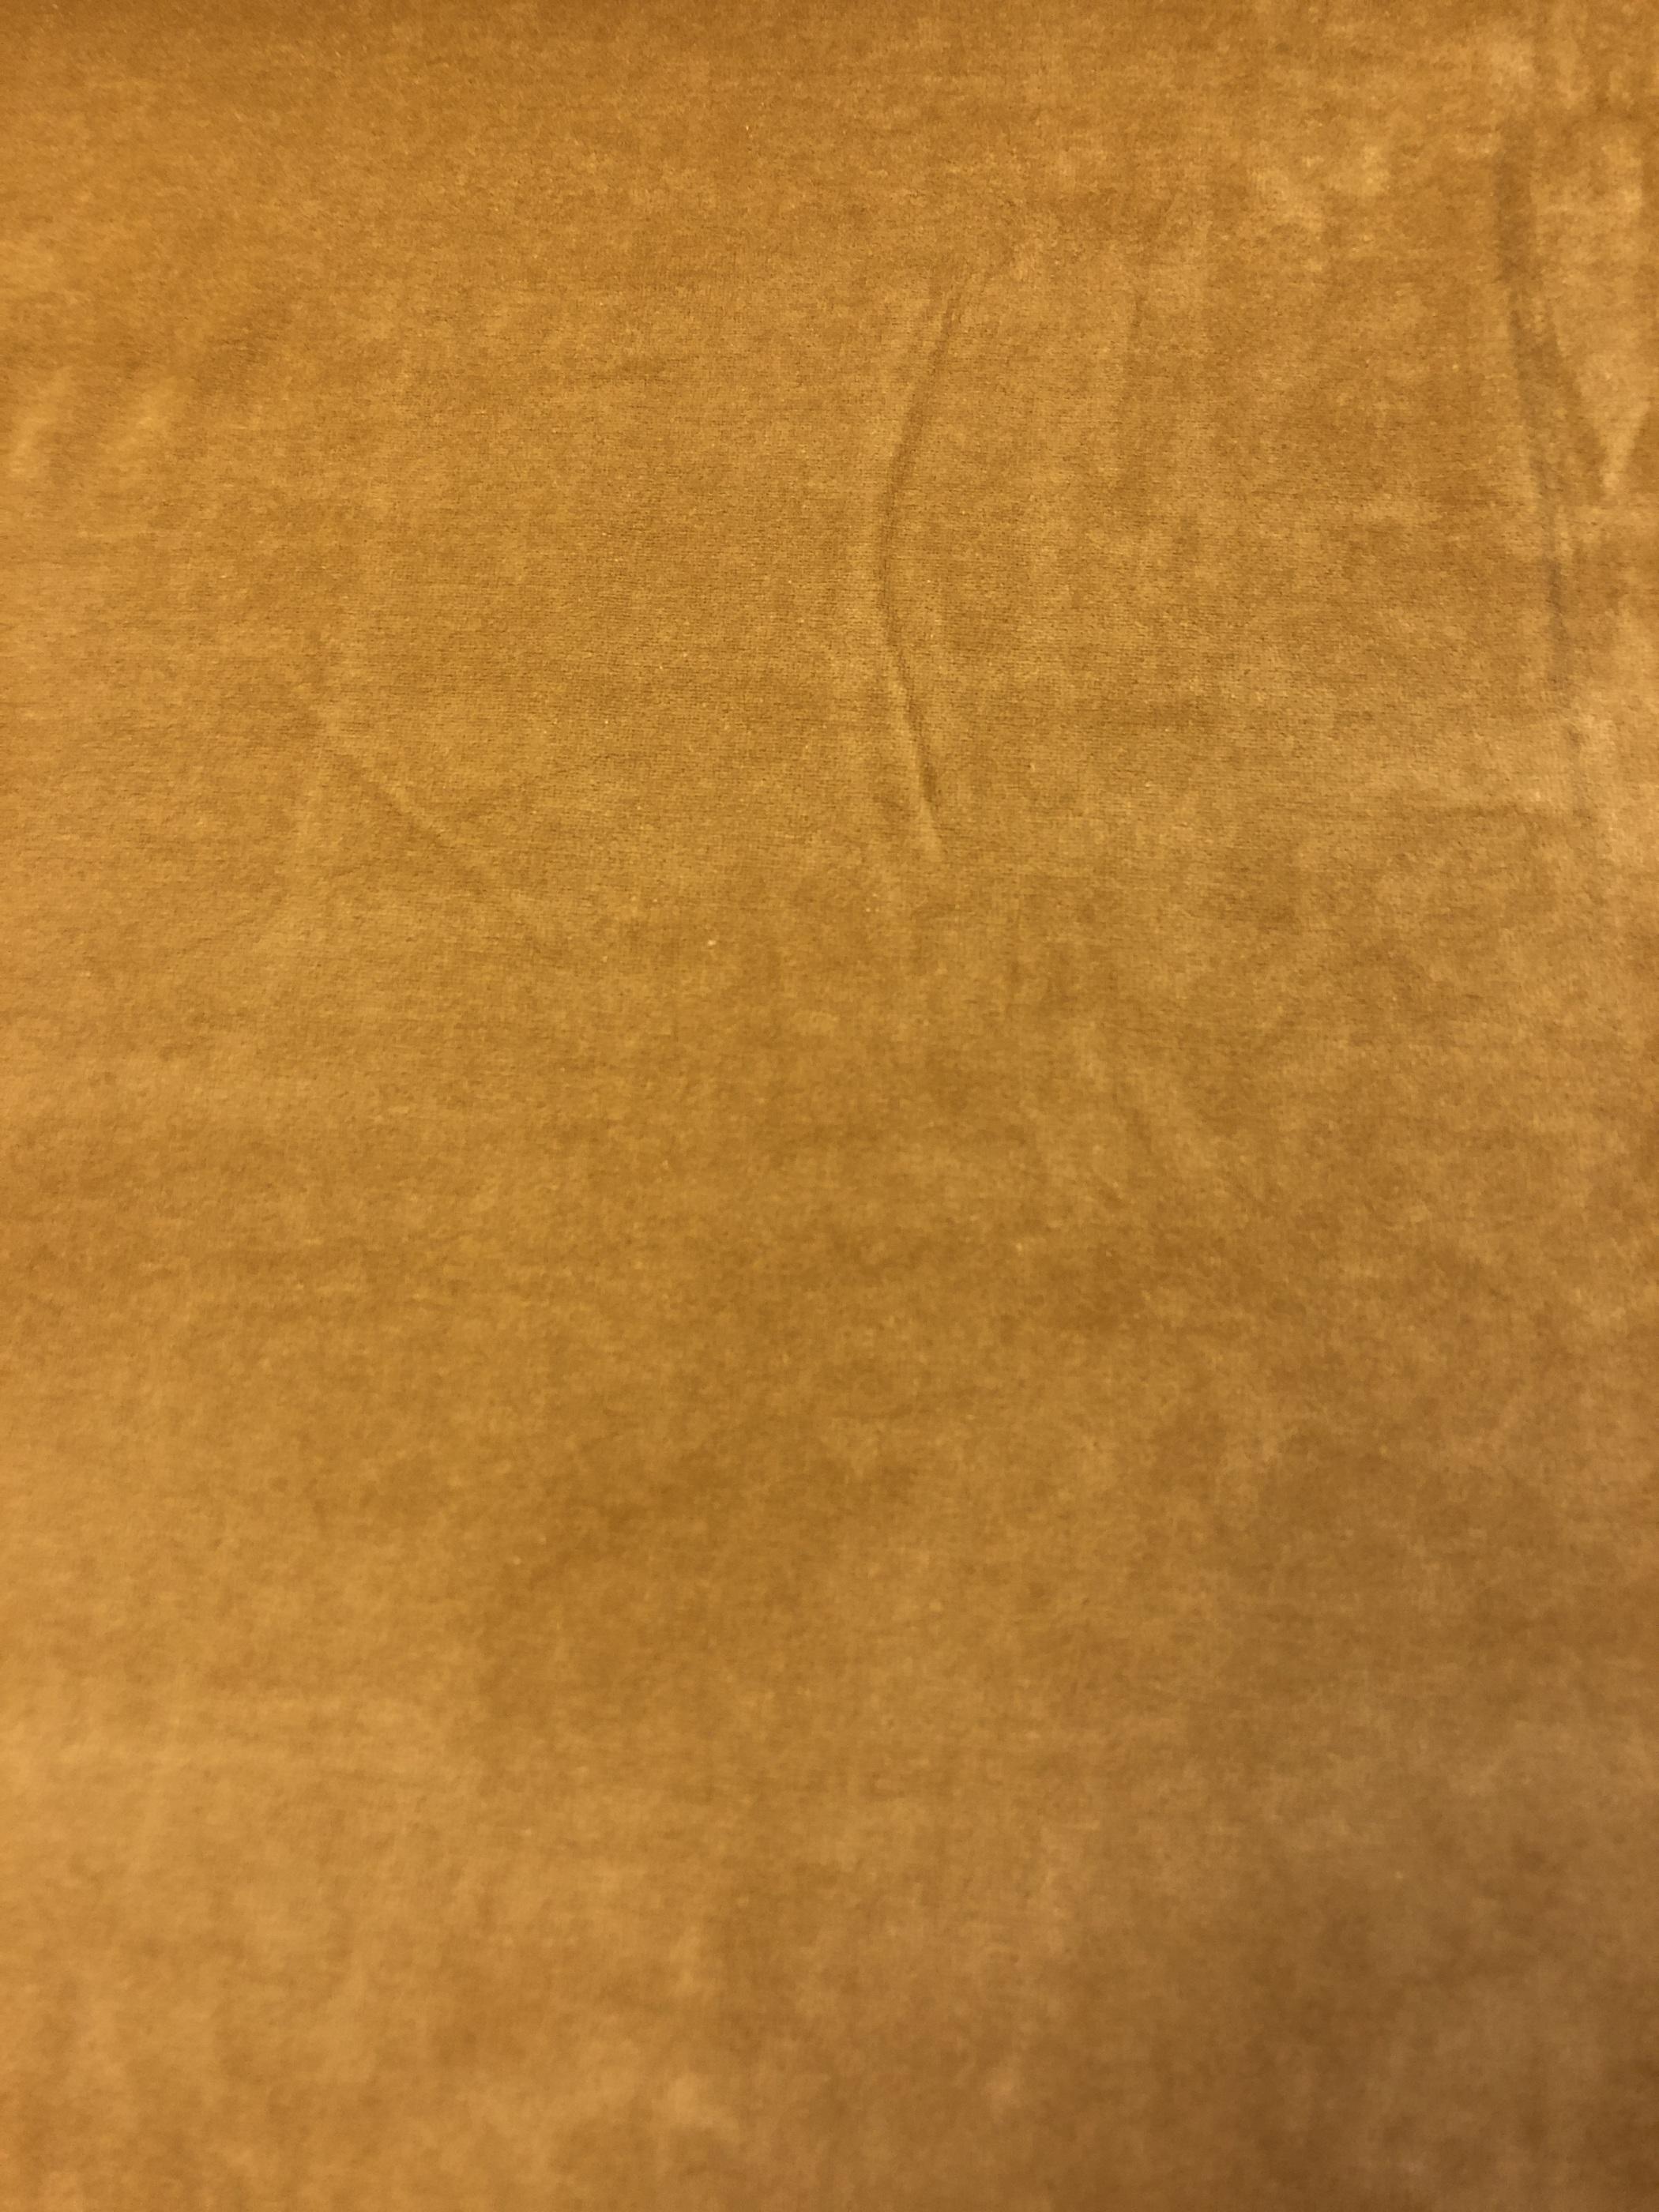 senapsgrul gul stretch velour stretchvelour laholm tyglust metervara modetyg